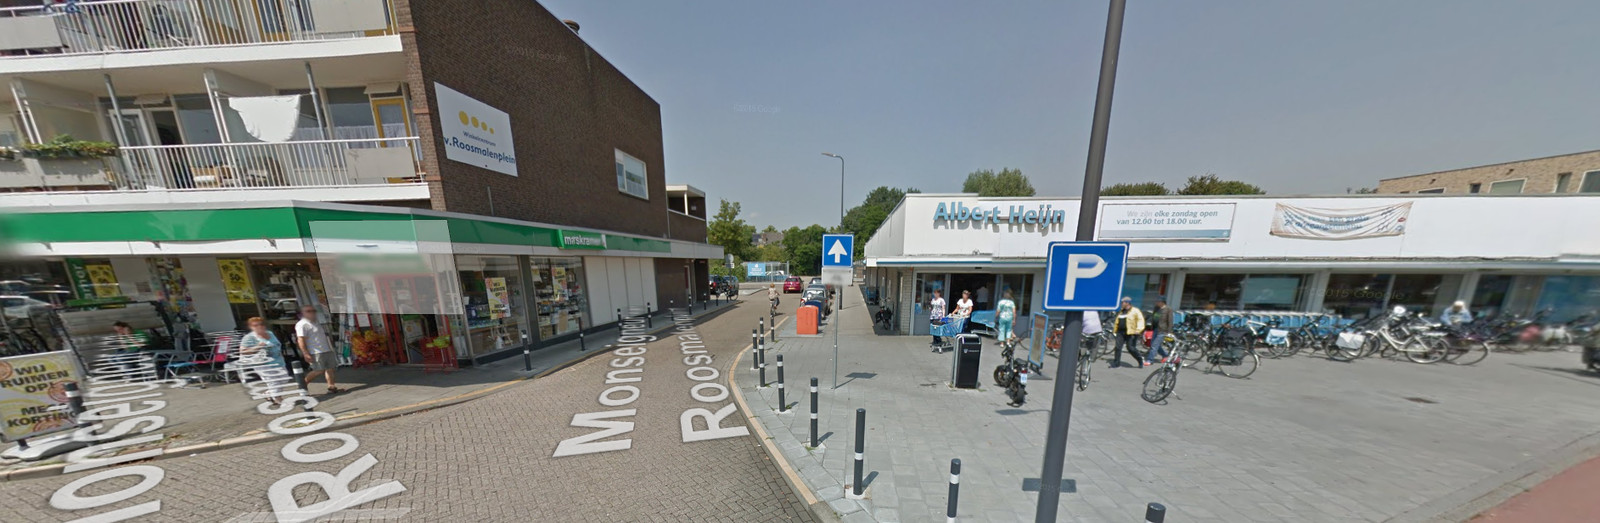 Roosmalenplein Den Bosch